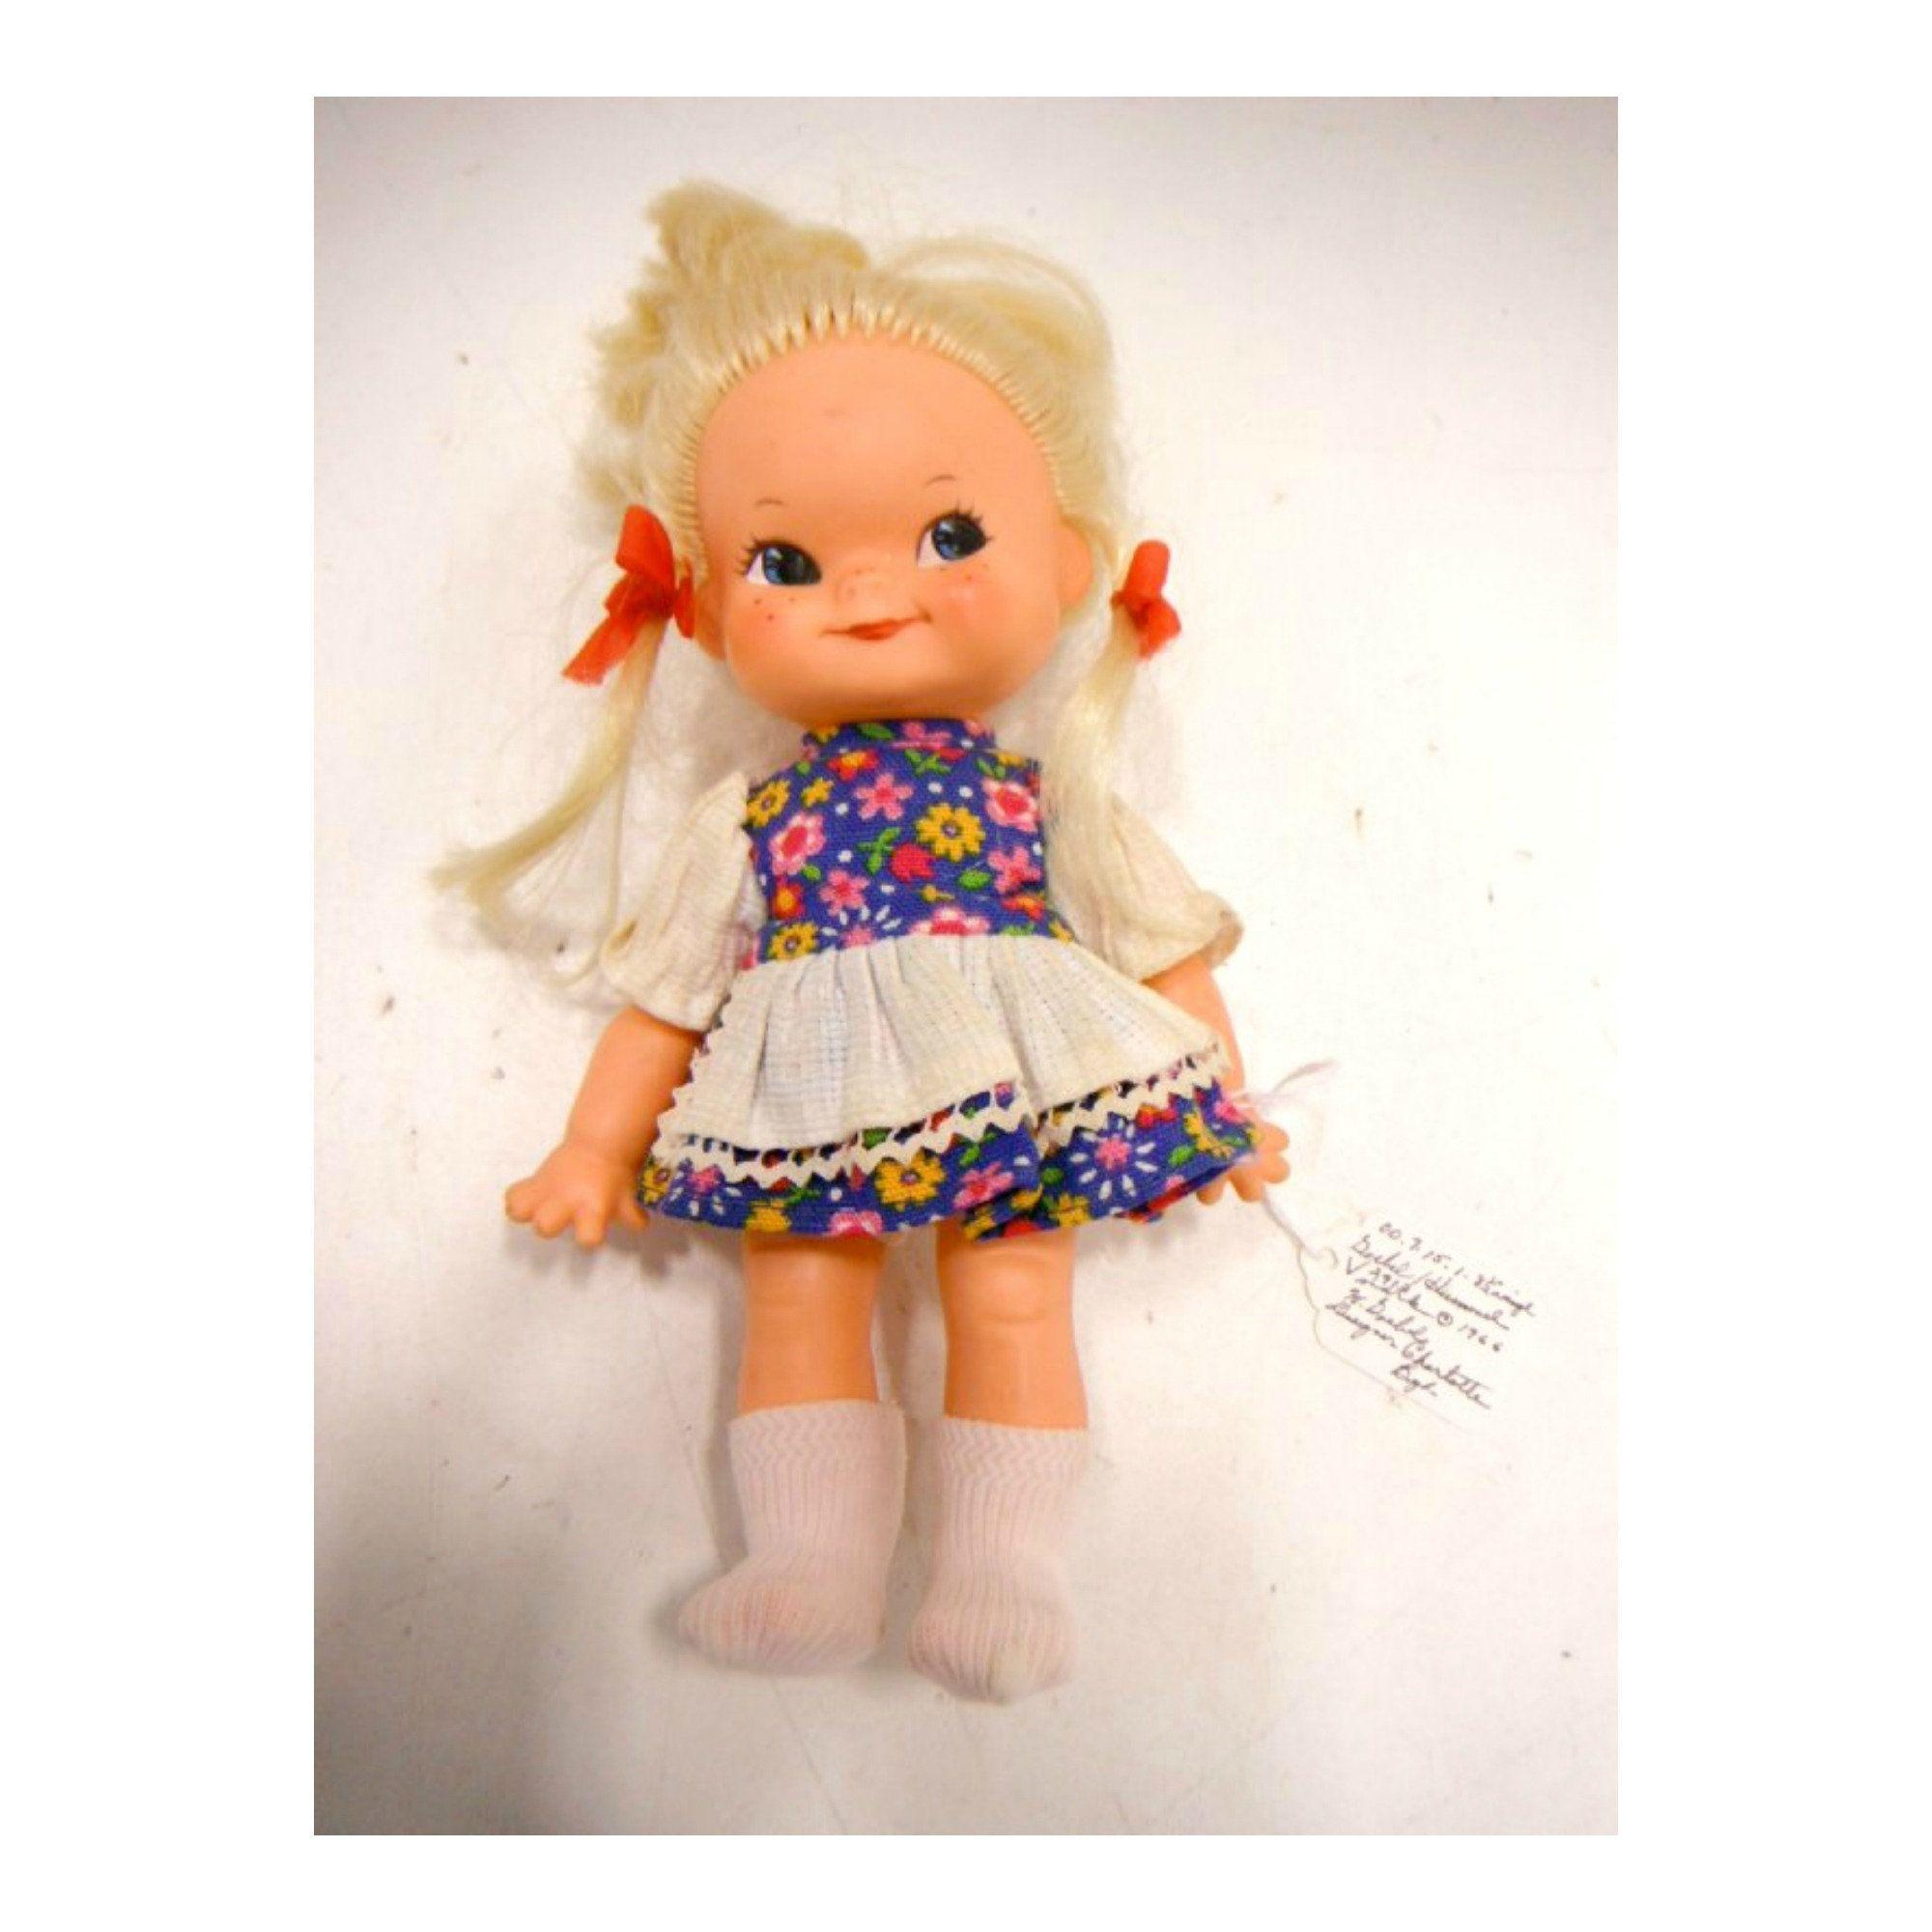 Vintage Goebel Charlot BYJ Rubber Doll, 1966, 2913, West Germany ...